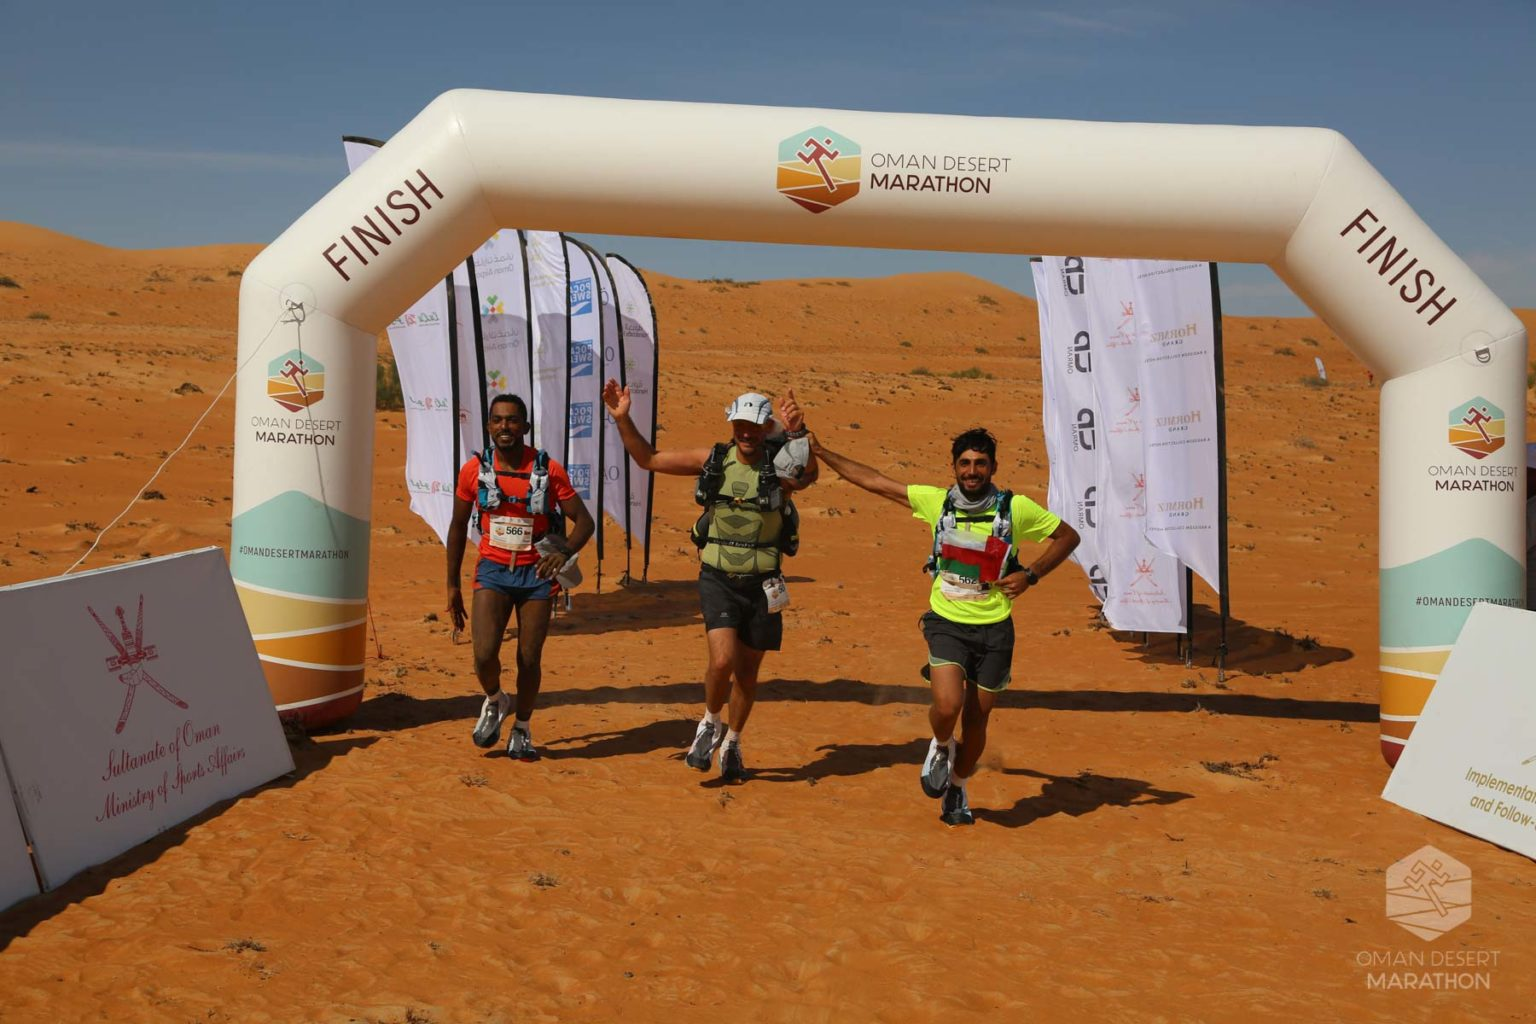 ICARUS Sports Partners with Oman Desert Marathon